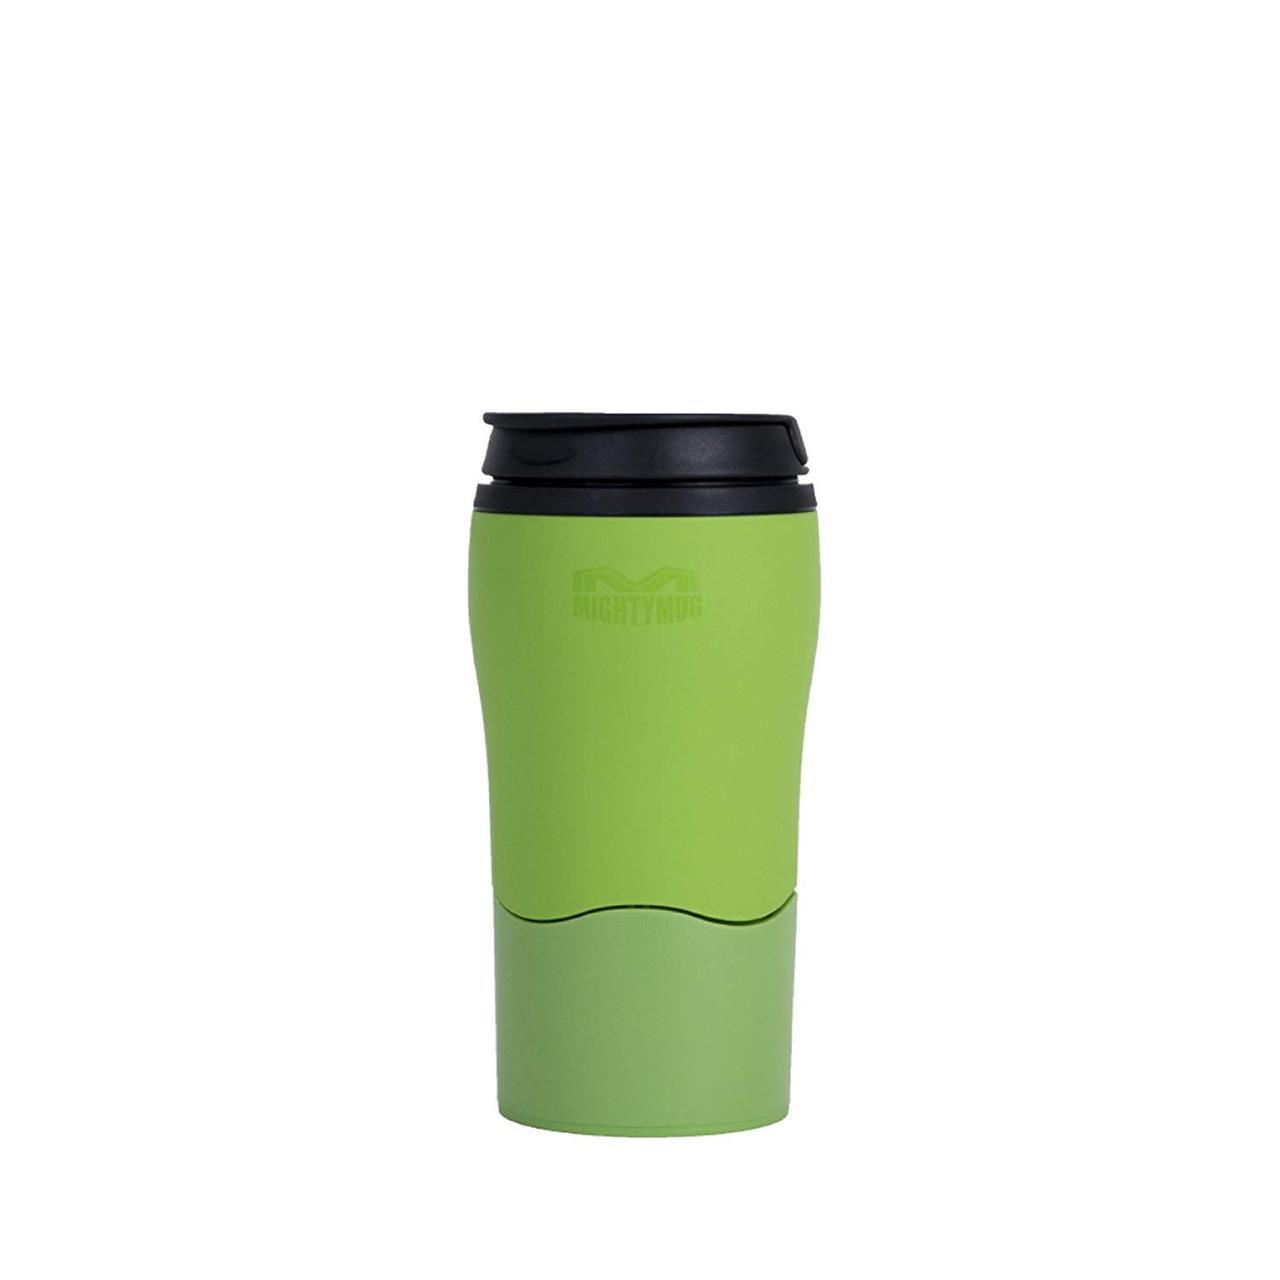 Не падающая кружка Mighty Mug 1975 Solo Green